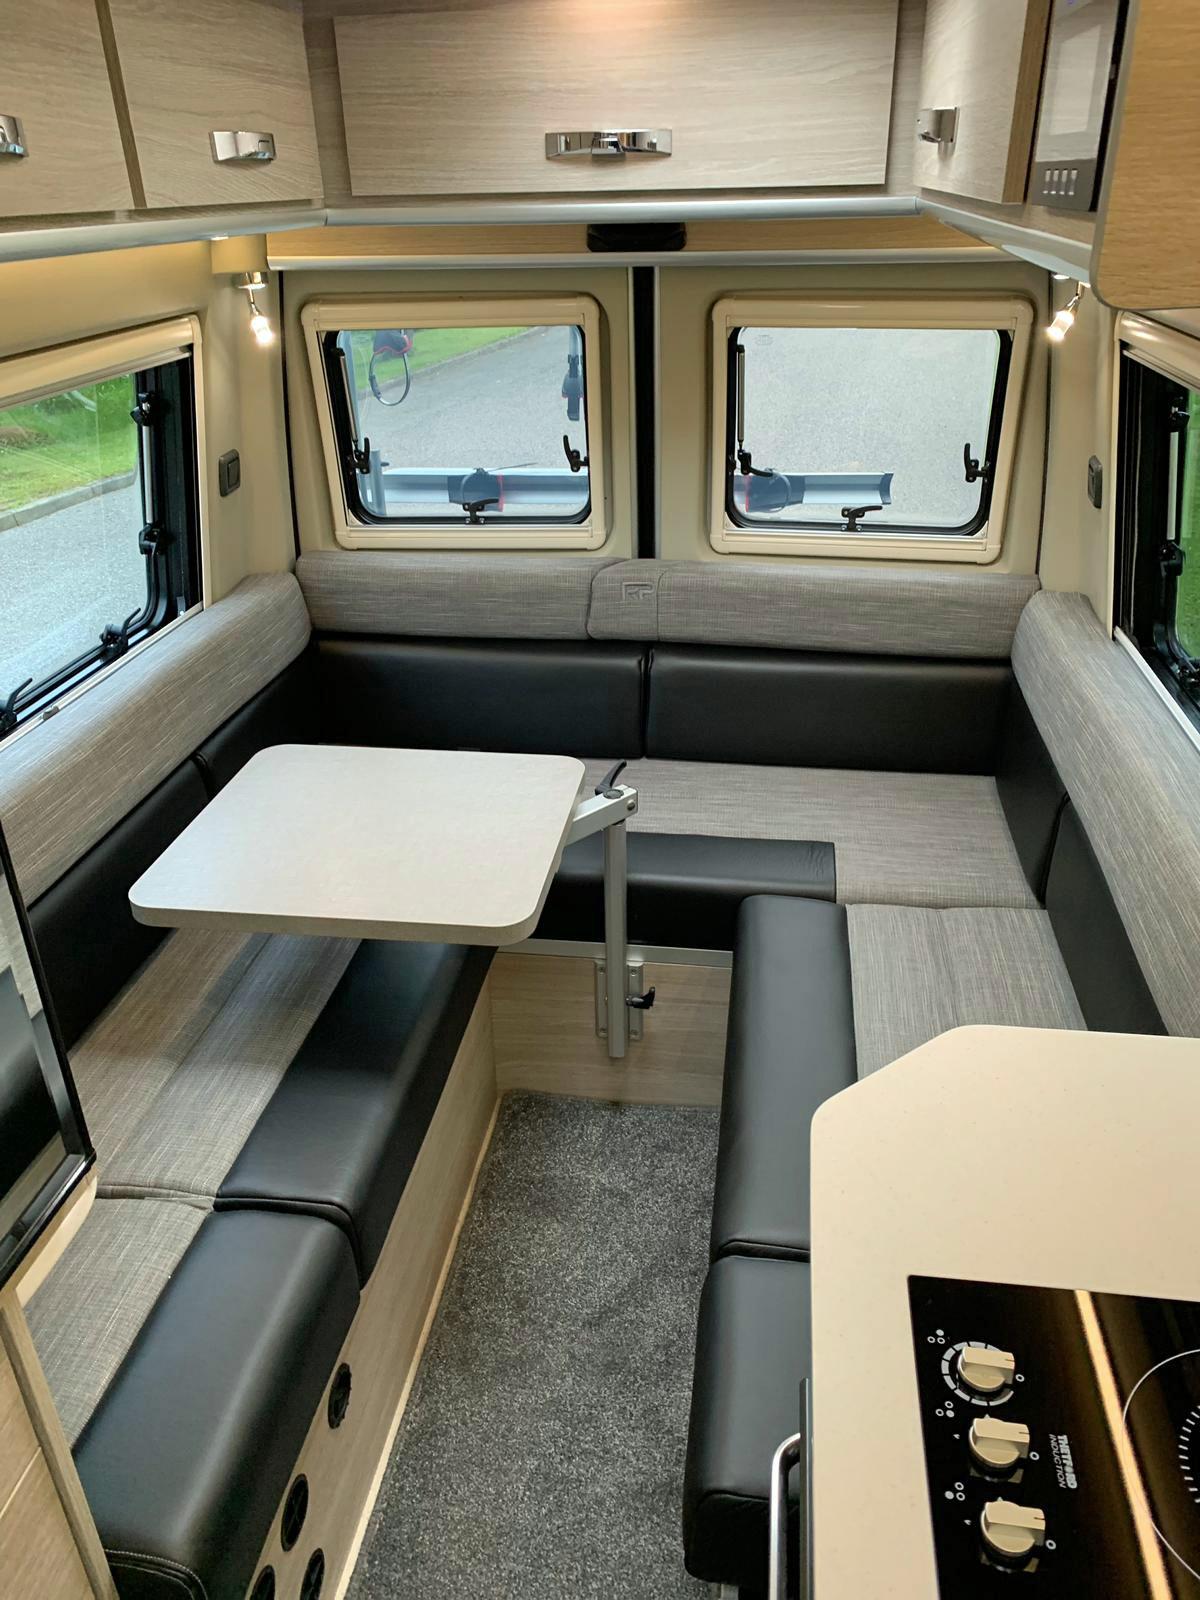 Rebel U-shaped lounge with pivot table